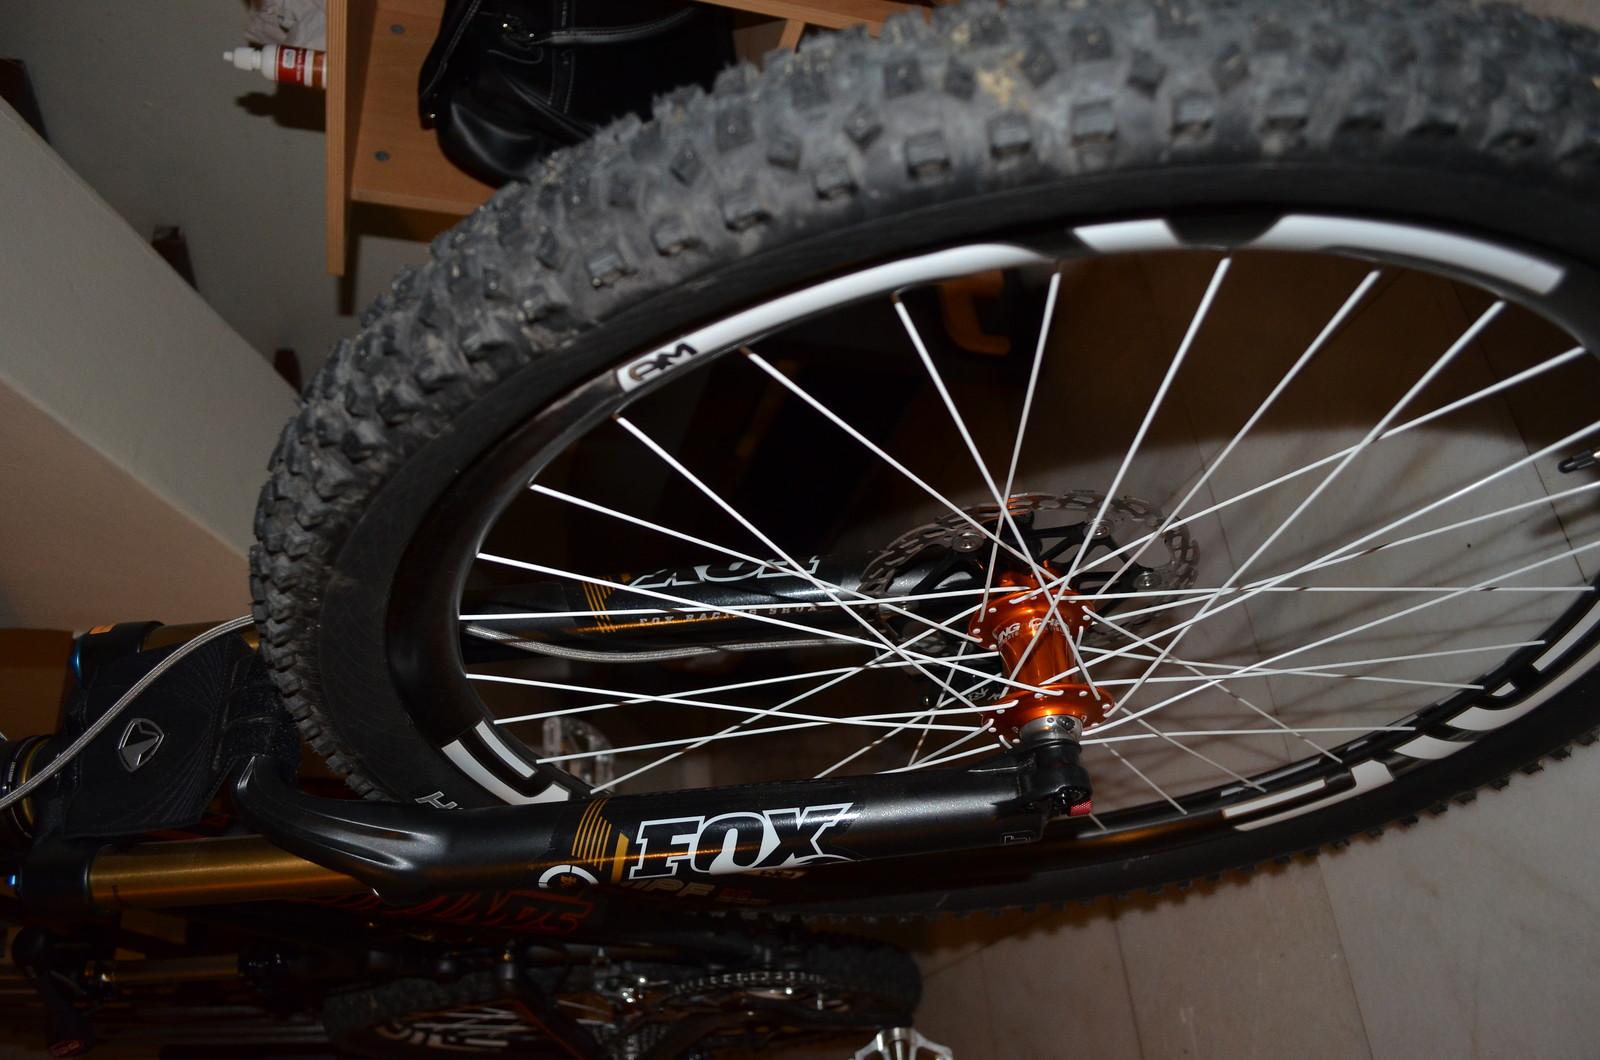 DSC 4571 - kenneth.jonathan.perkins.jr - Mountain Biking Pictures - Vital MTB